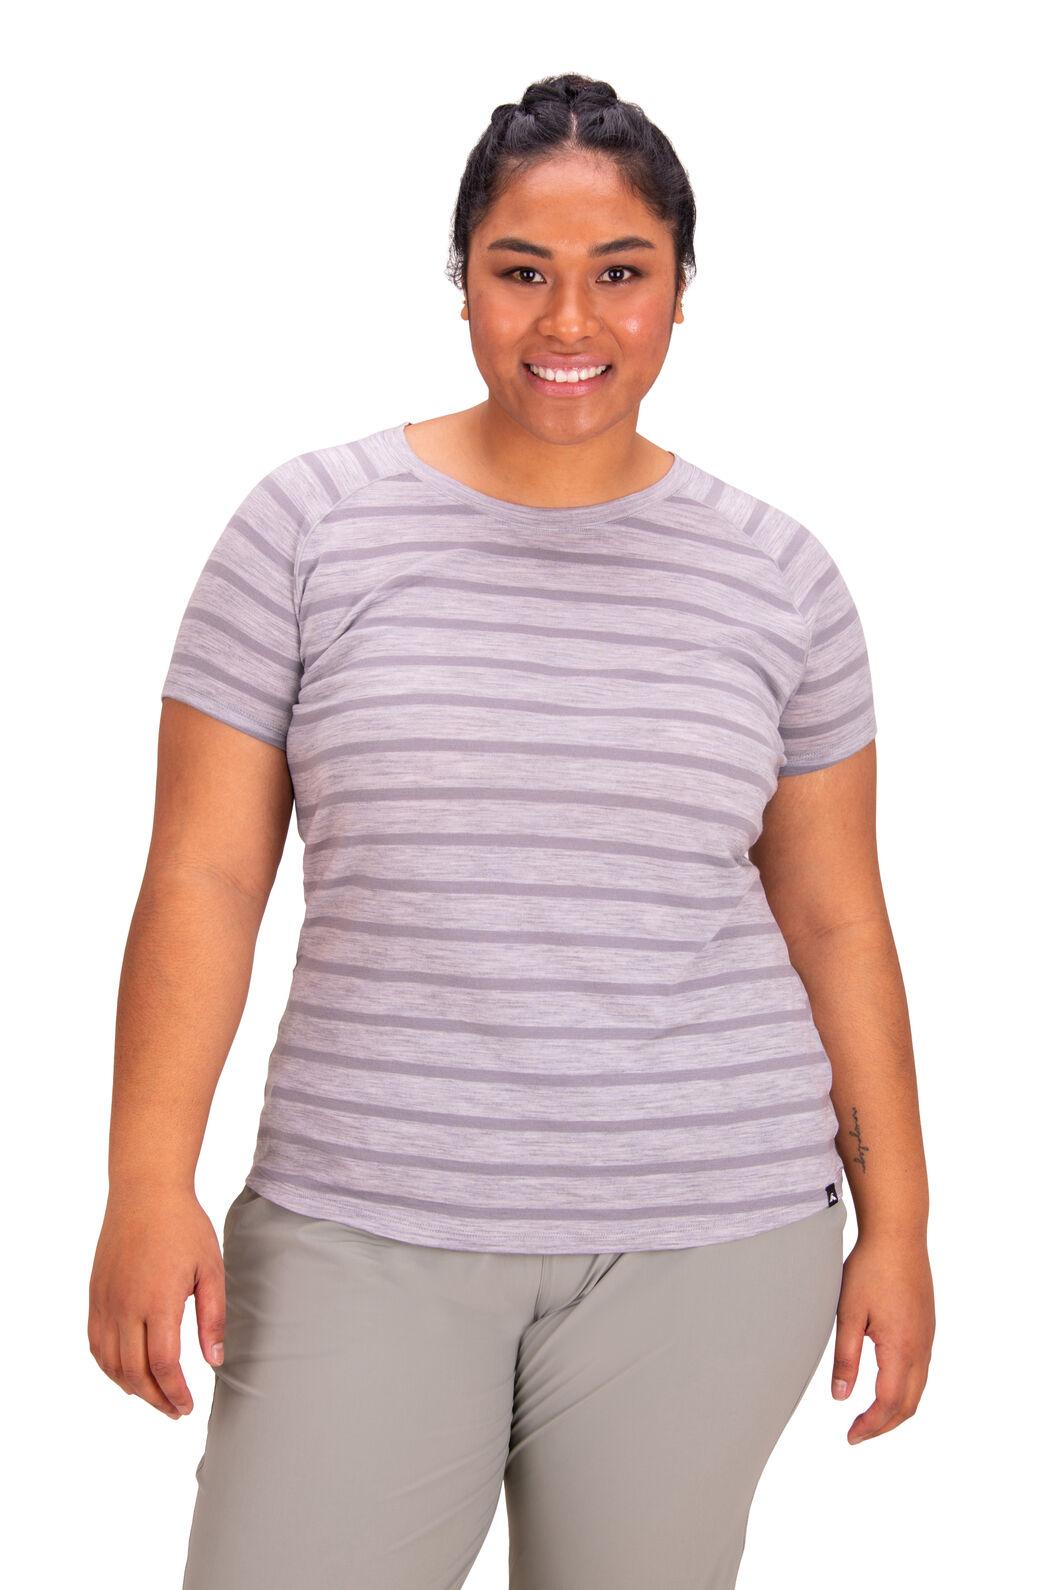 Macpac Women's Ella Short Sleeve Merino Tee, Light Grey Stripe, hi-res